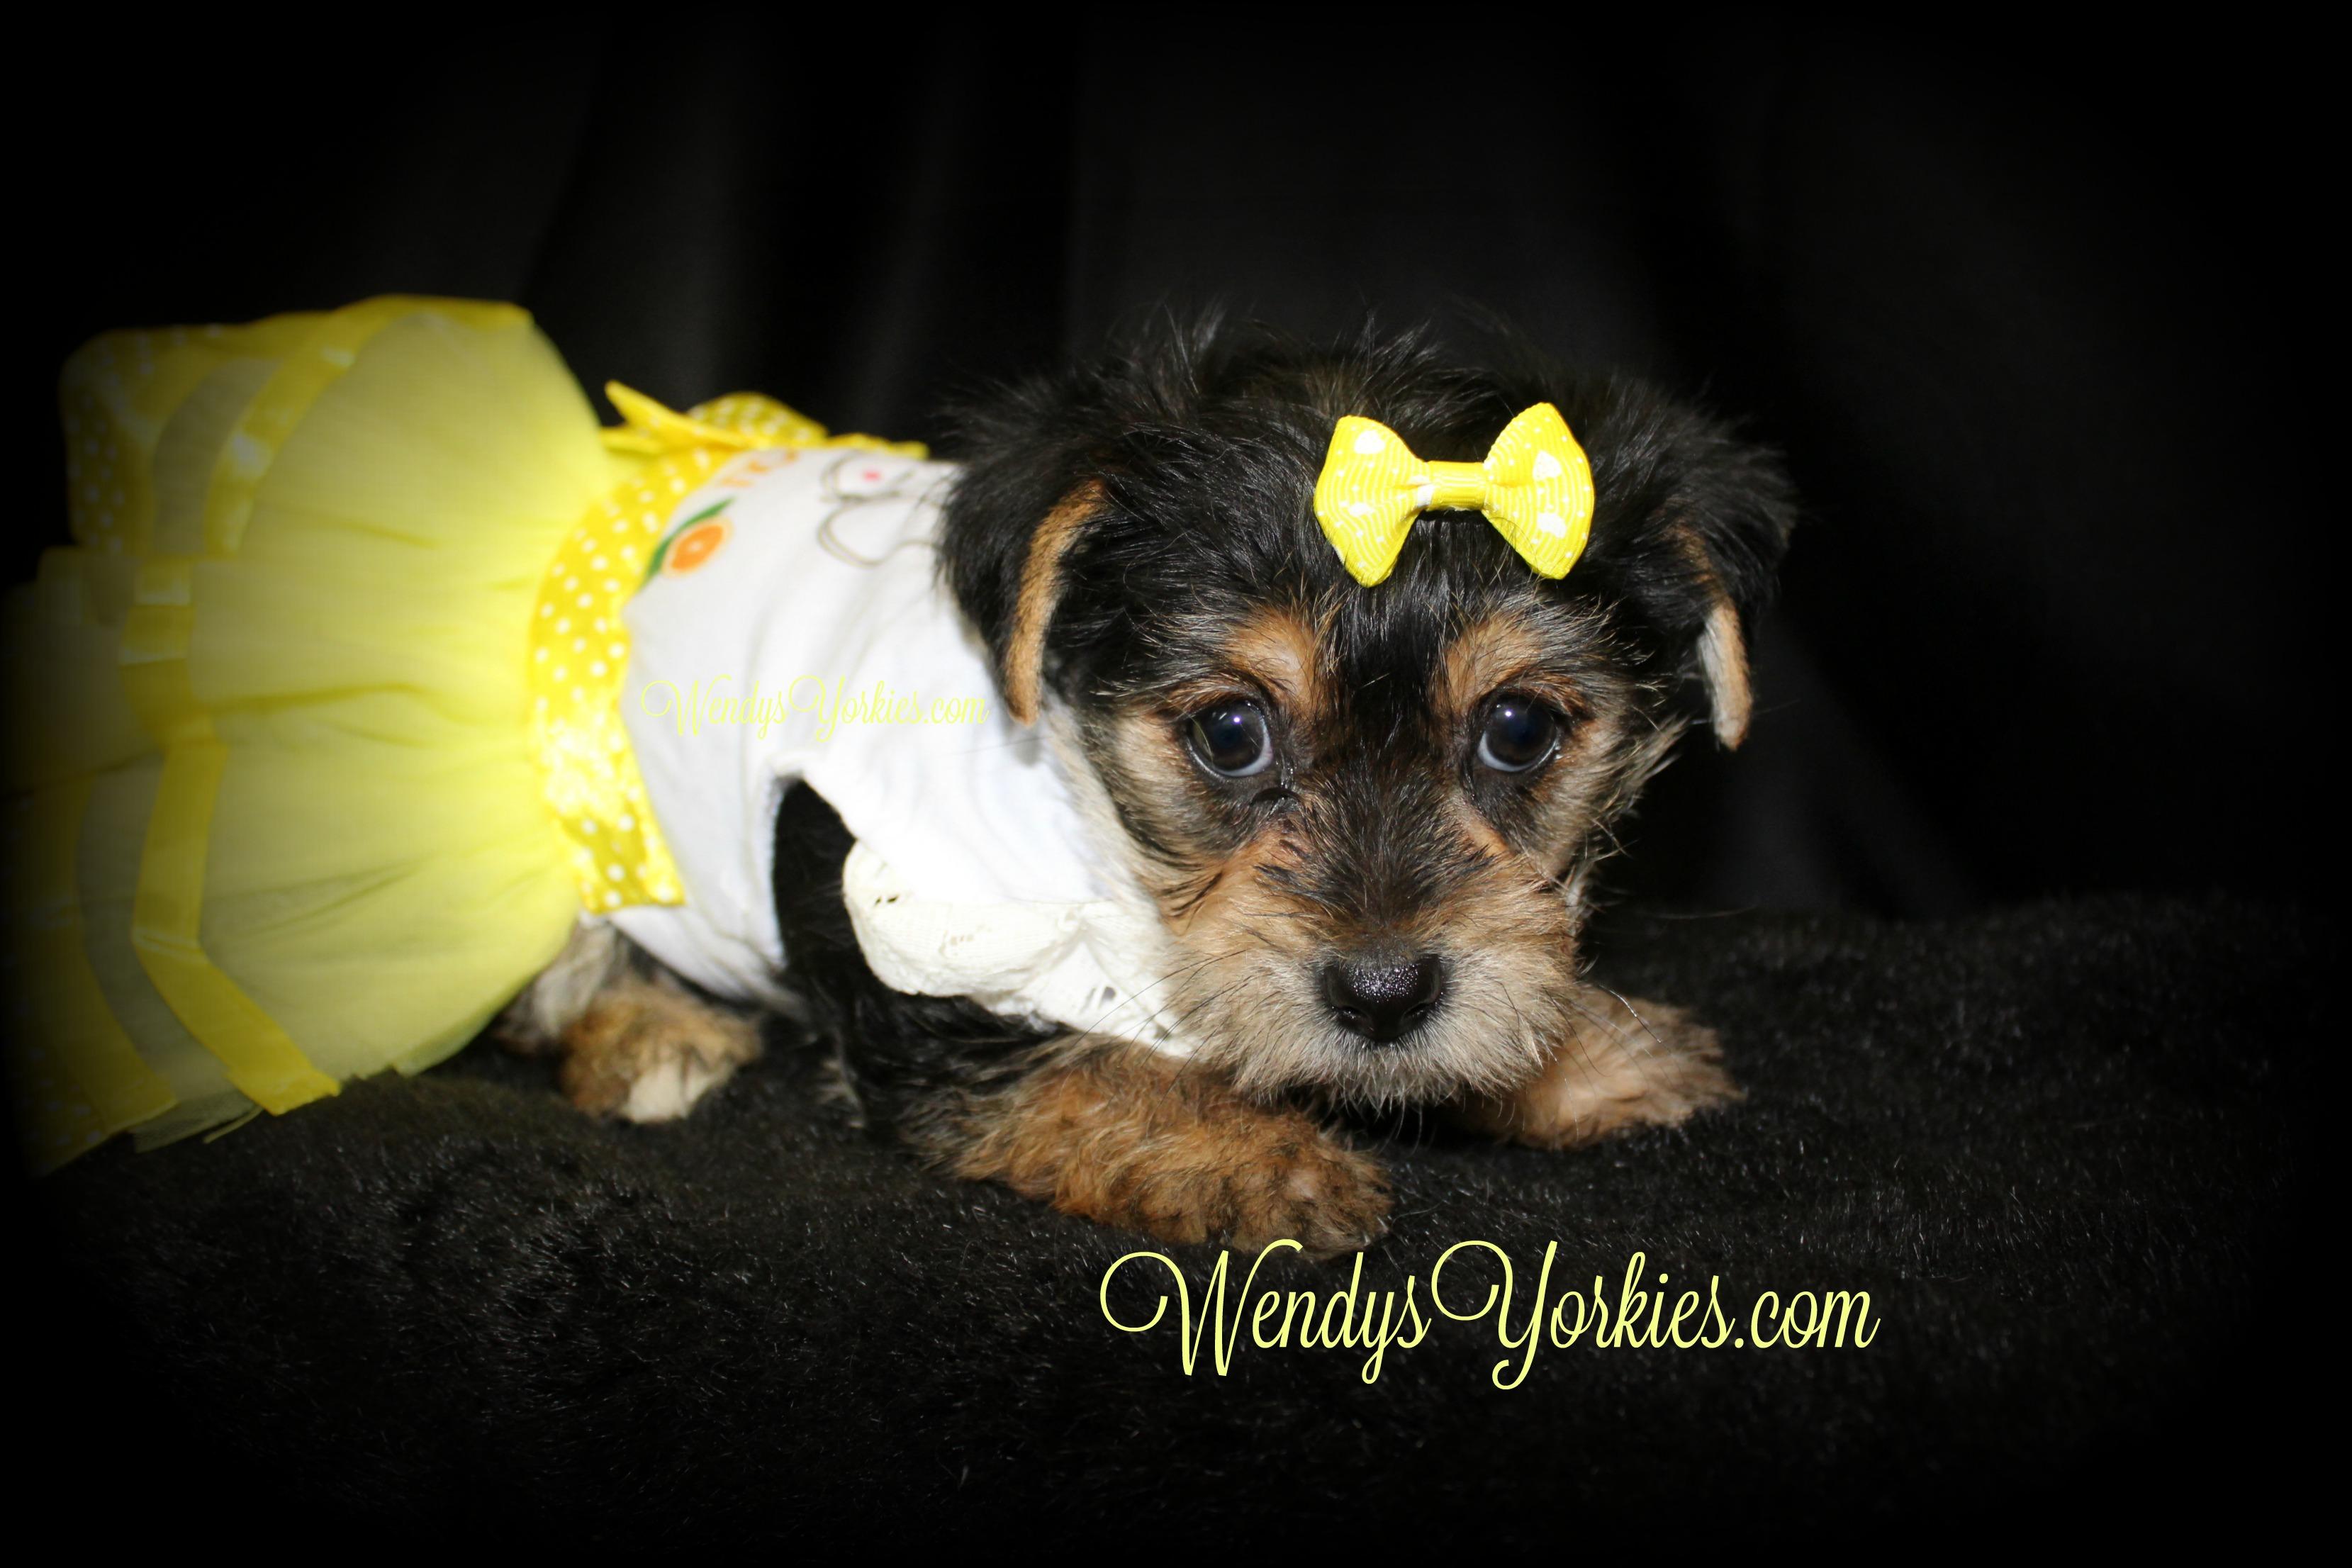 Yorkie puppies for sale, Pipper, wendysYorkies.com